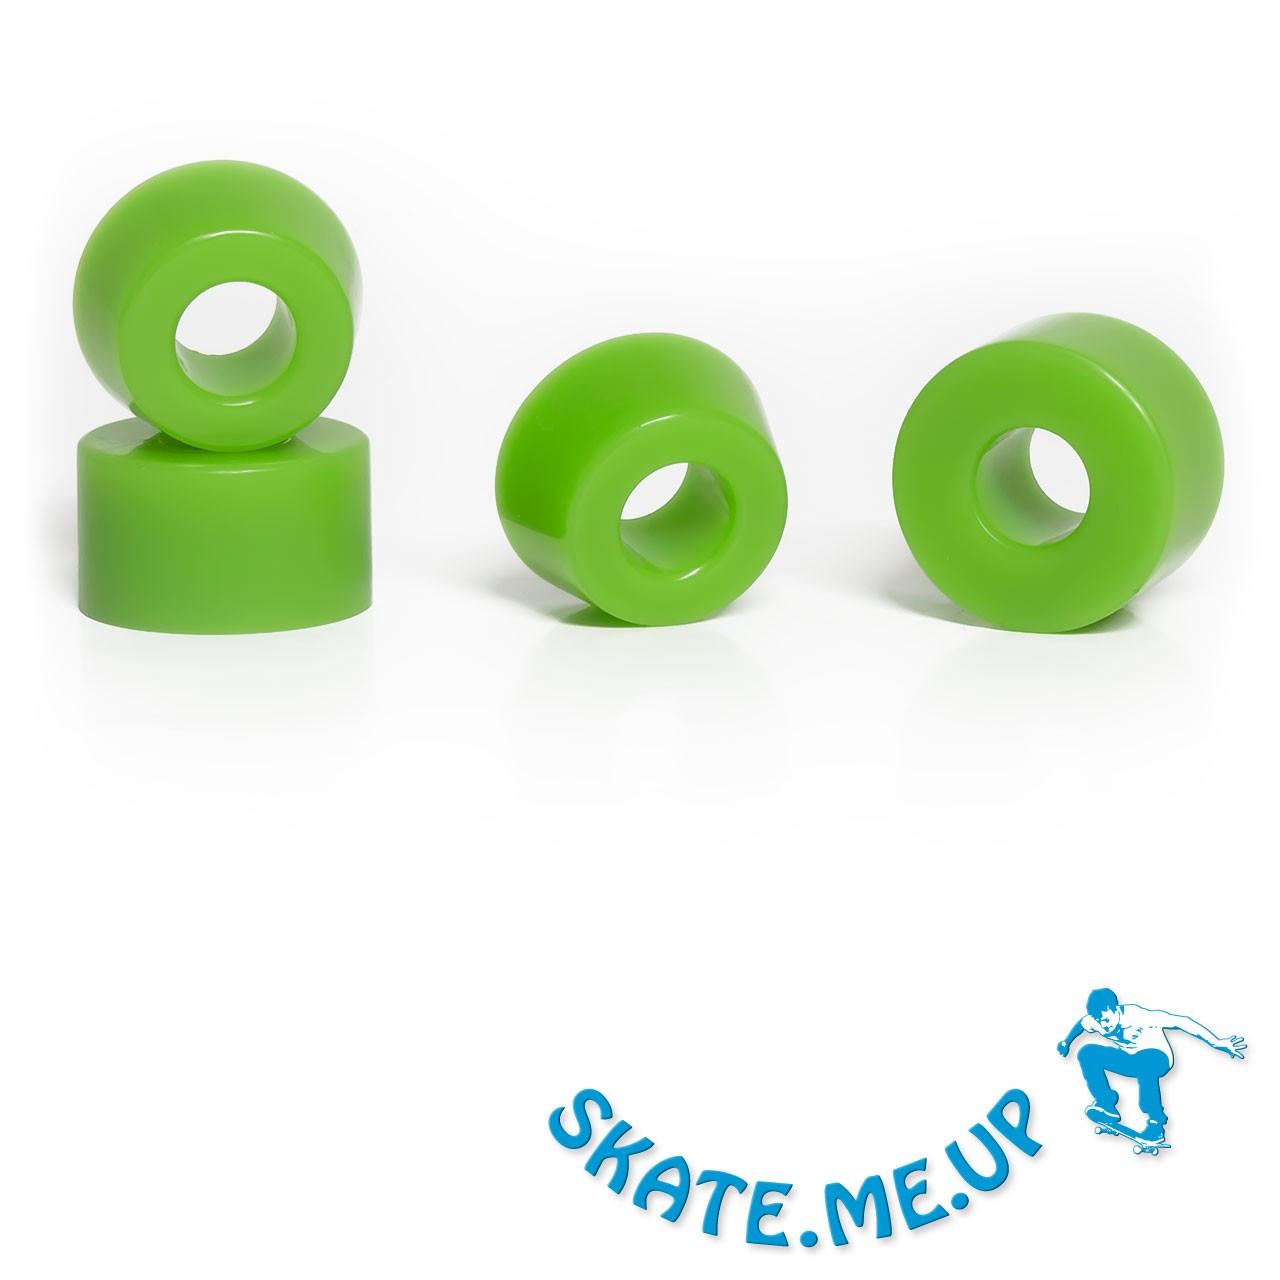 Skateboard / Longboard - Bushings - Lenkgummi Set für zwei Achsen - 85A grün [weicher]